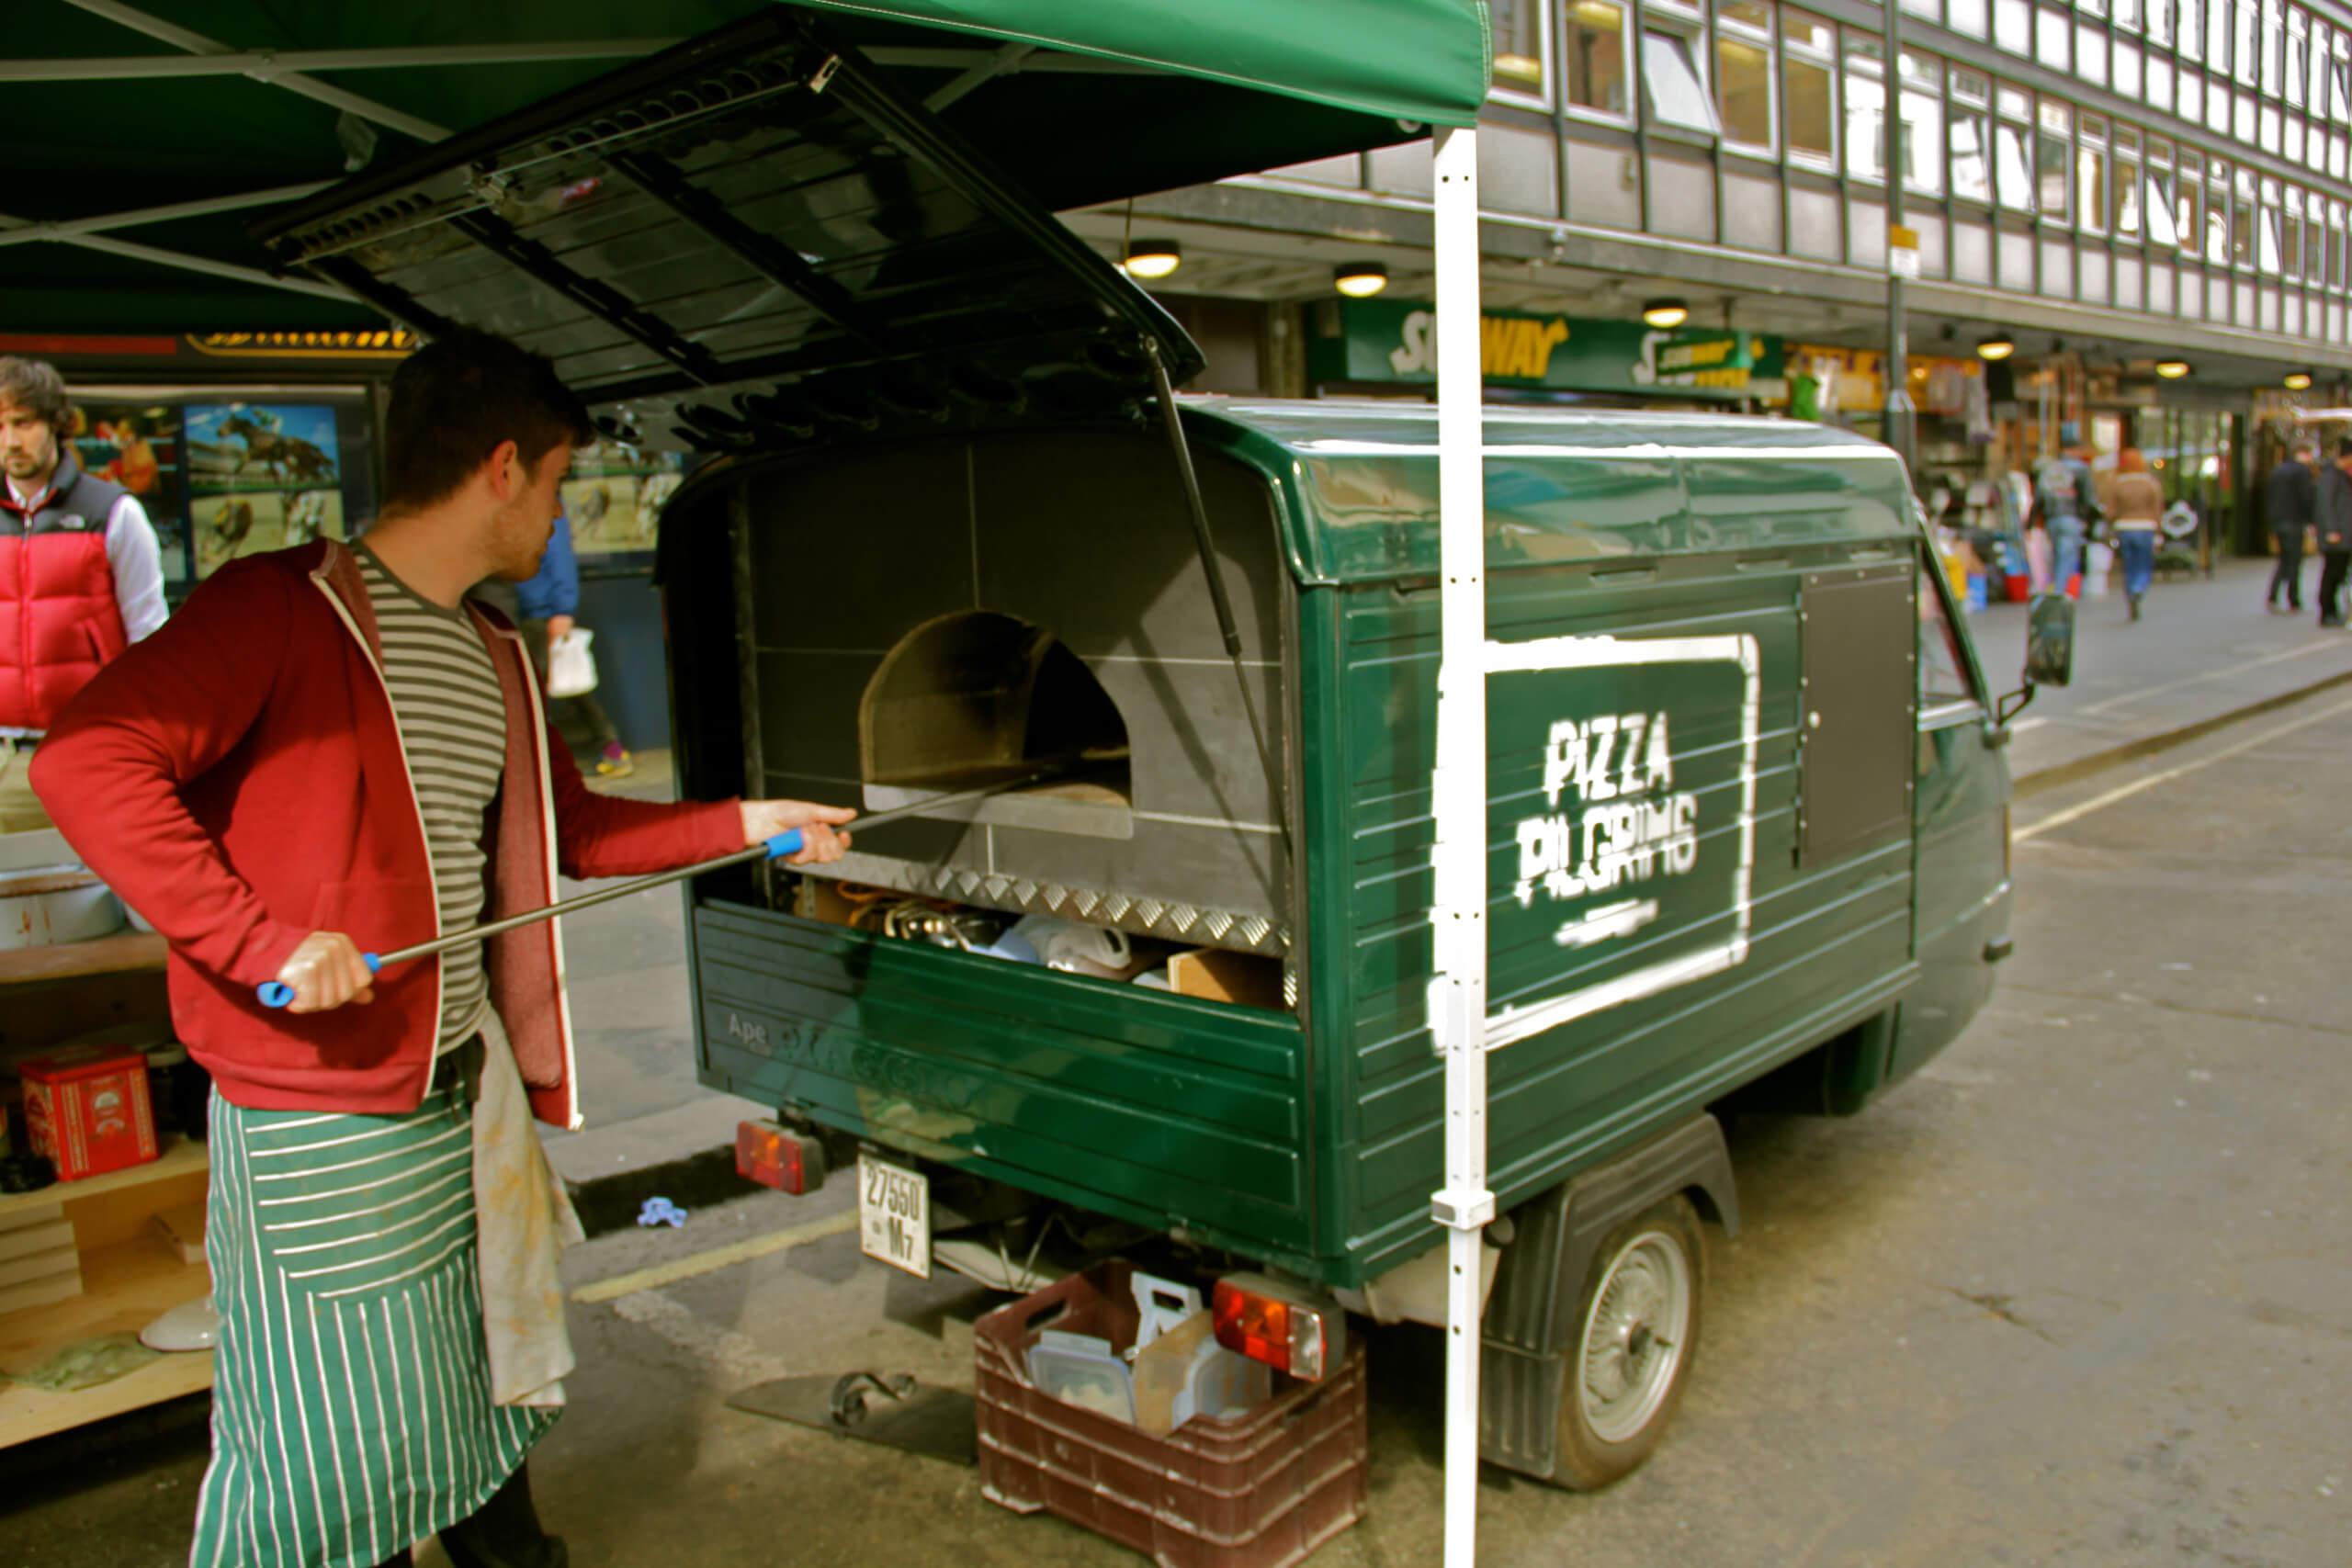 Pizza Pilgrims van, Start Your Own Pizza Business